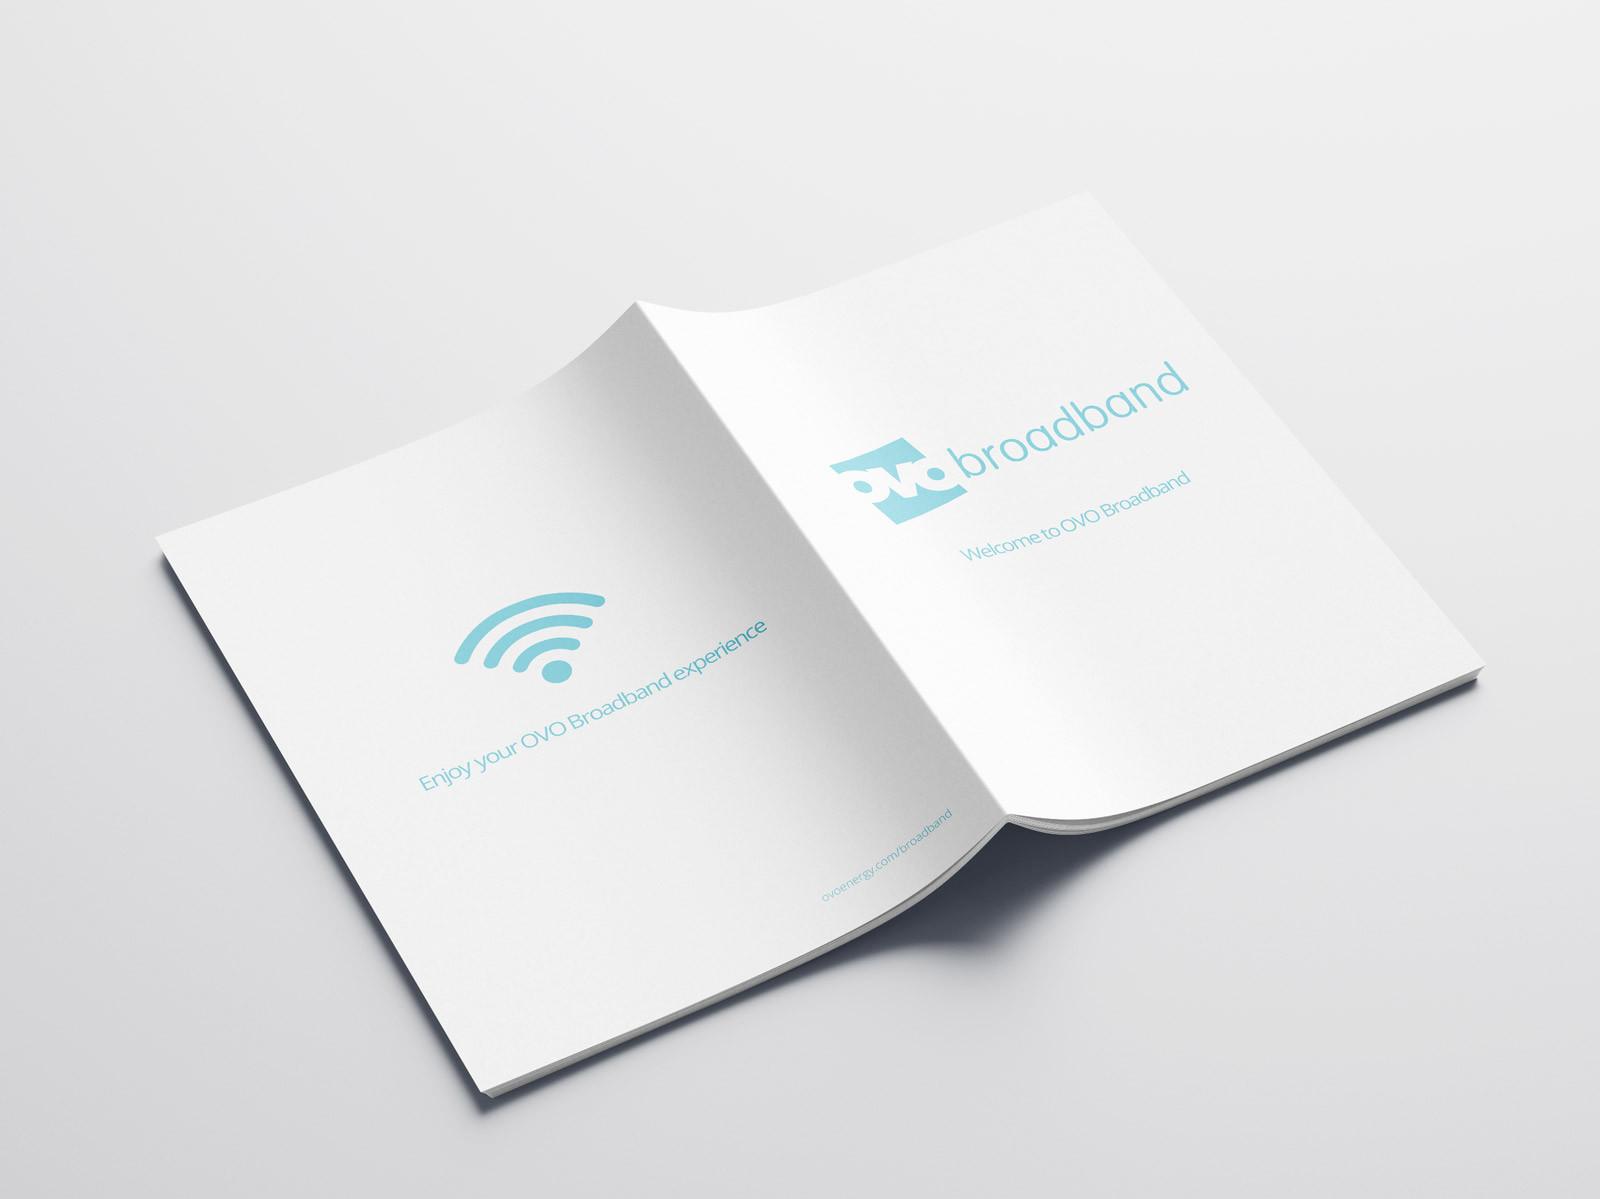 broadband manual